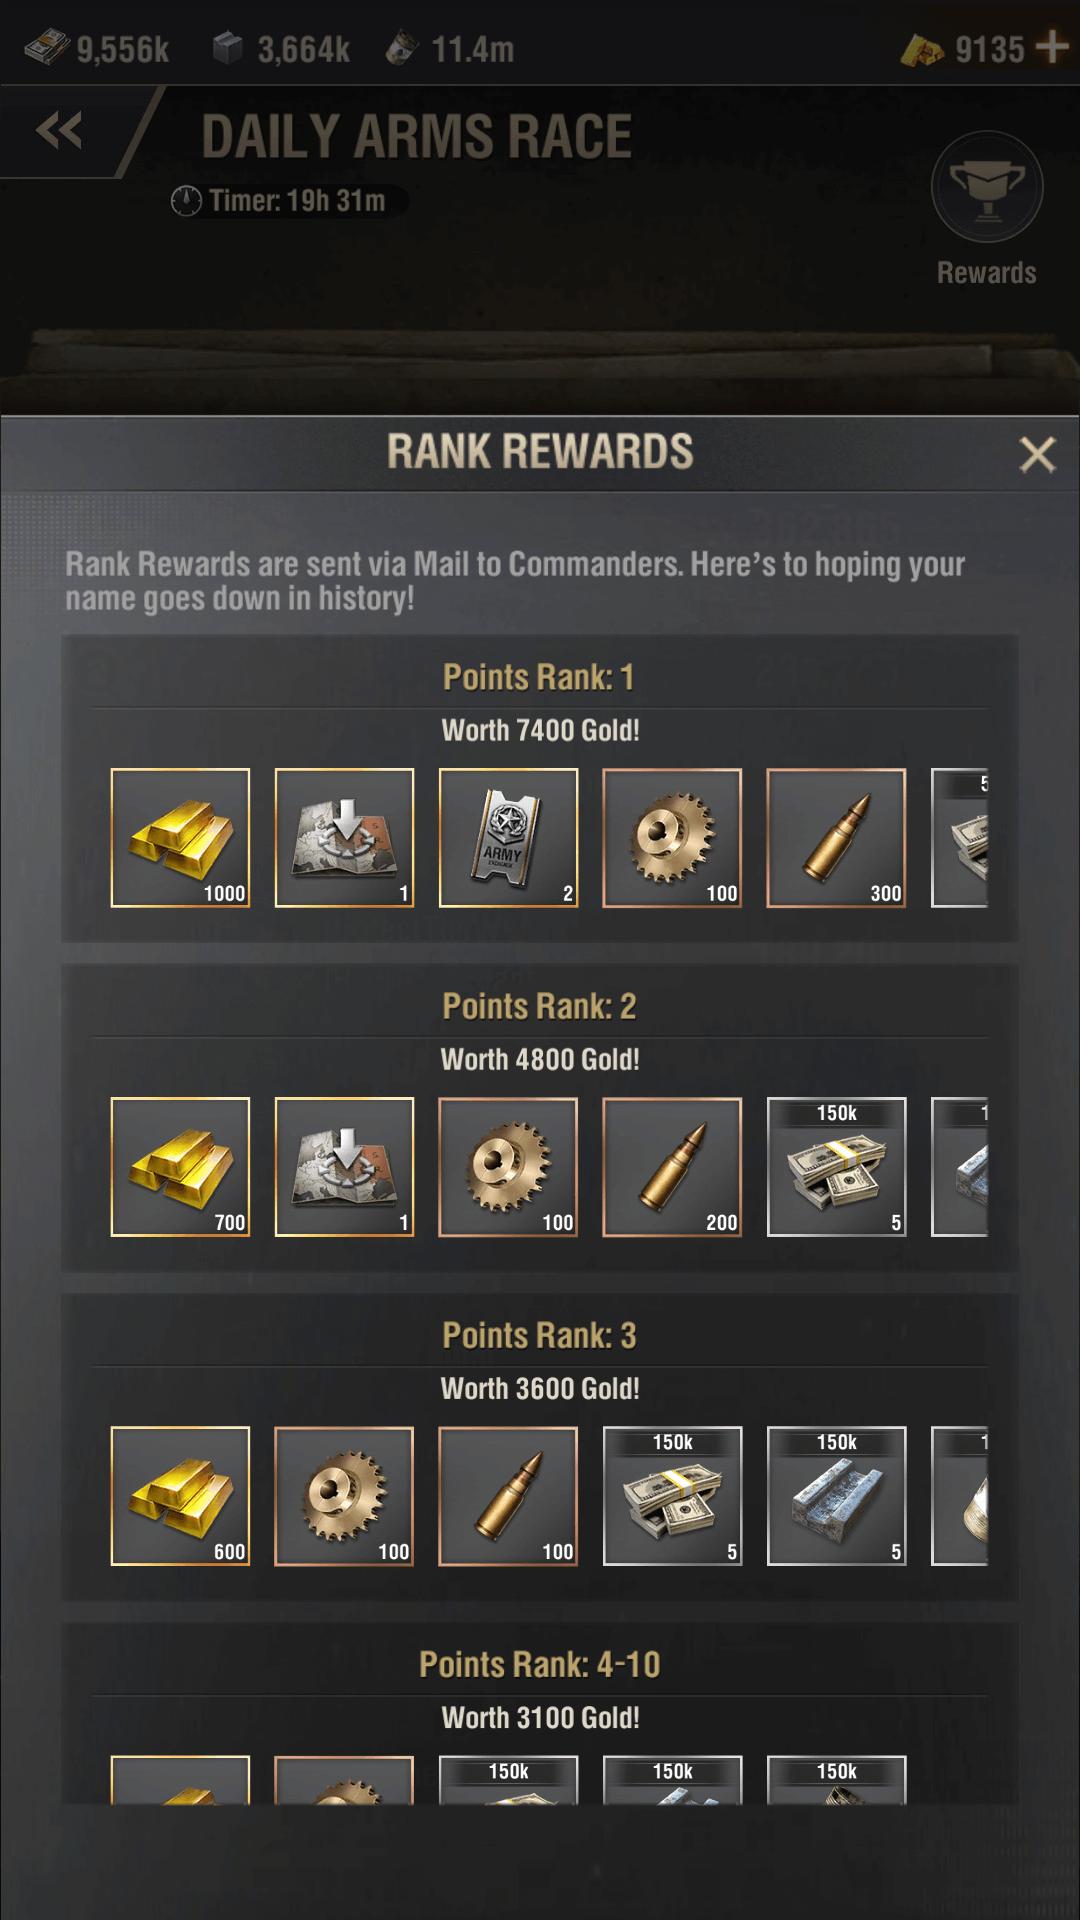 warpath arms race event screenshot 3